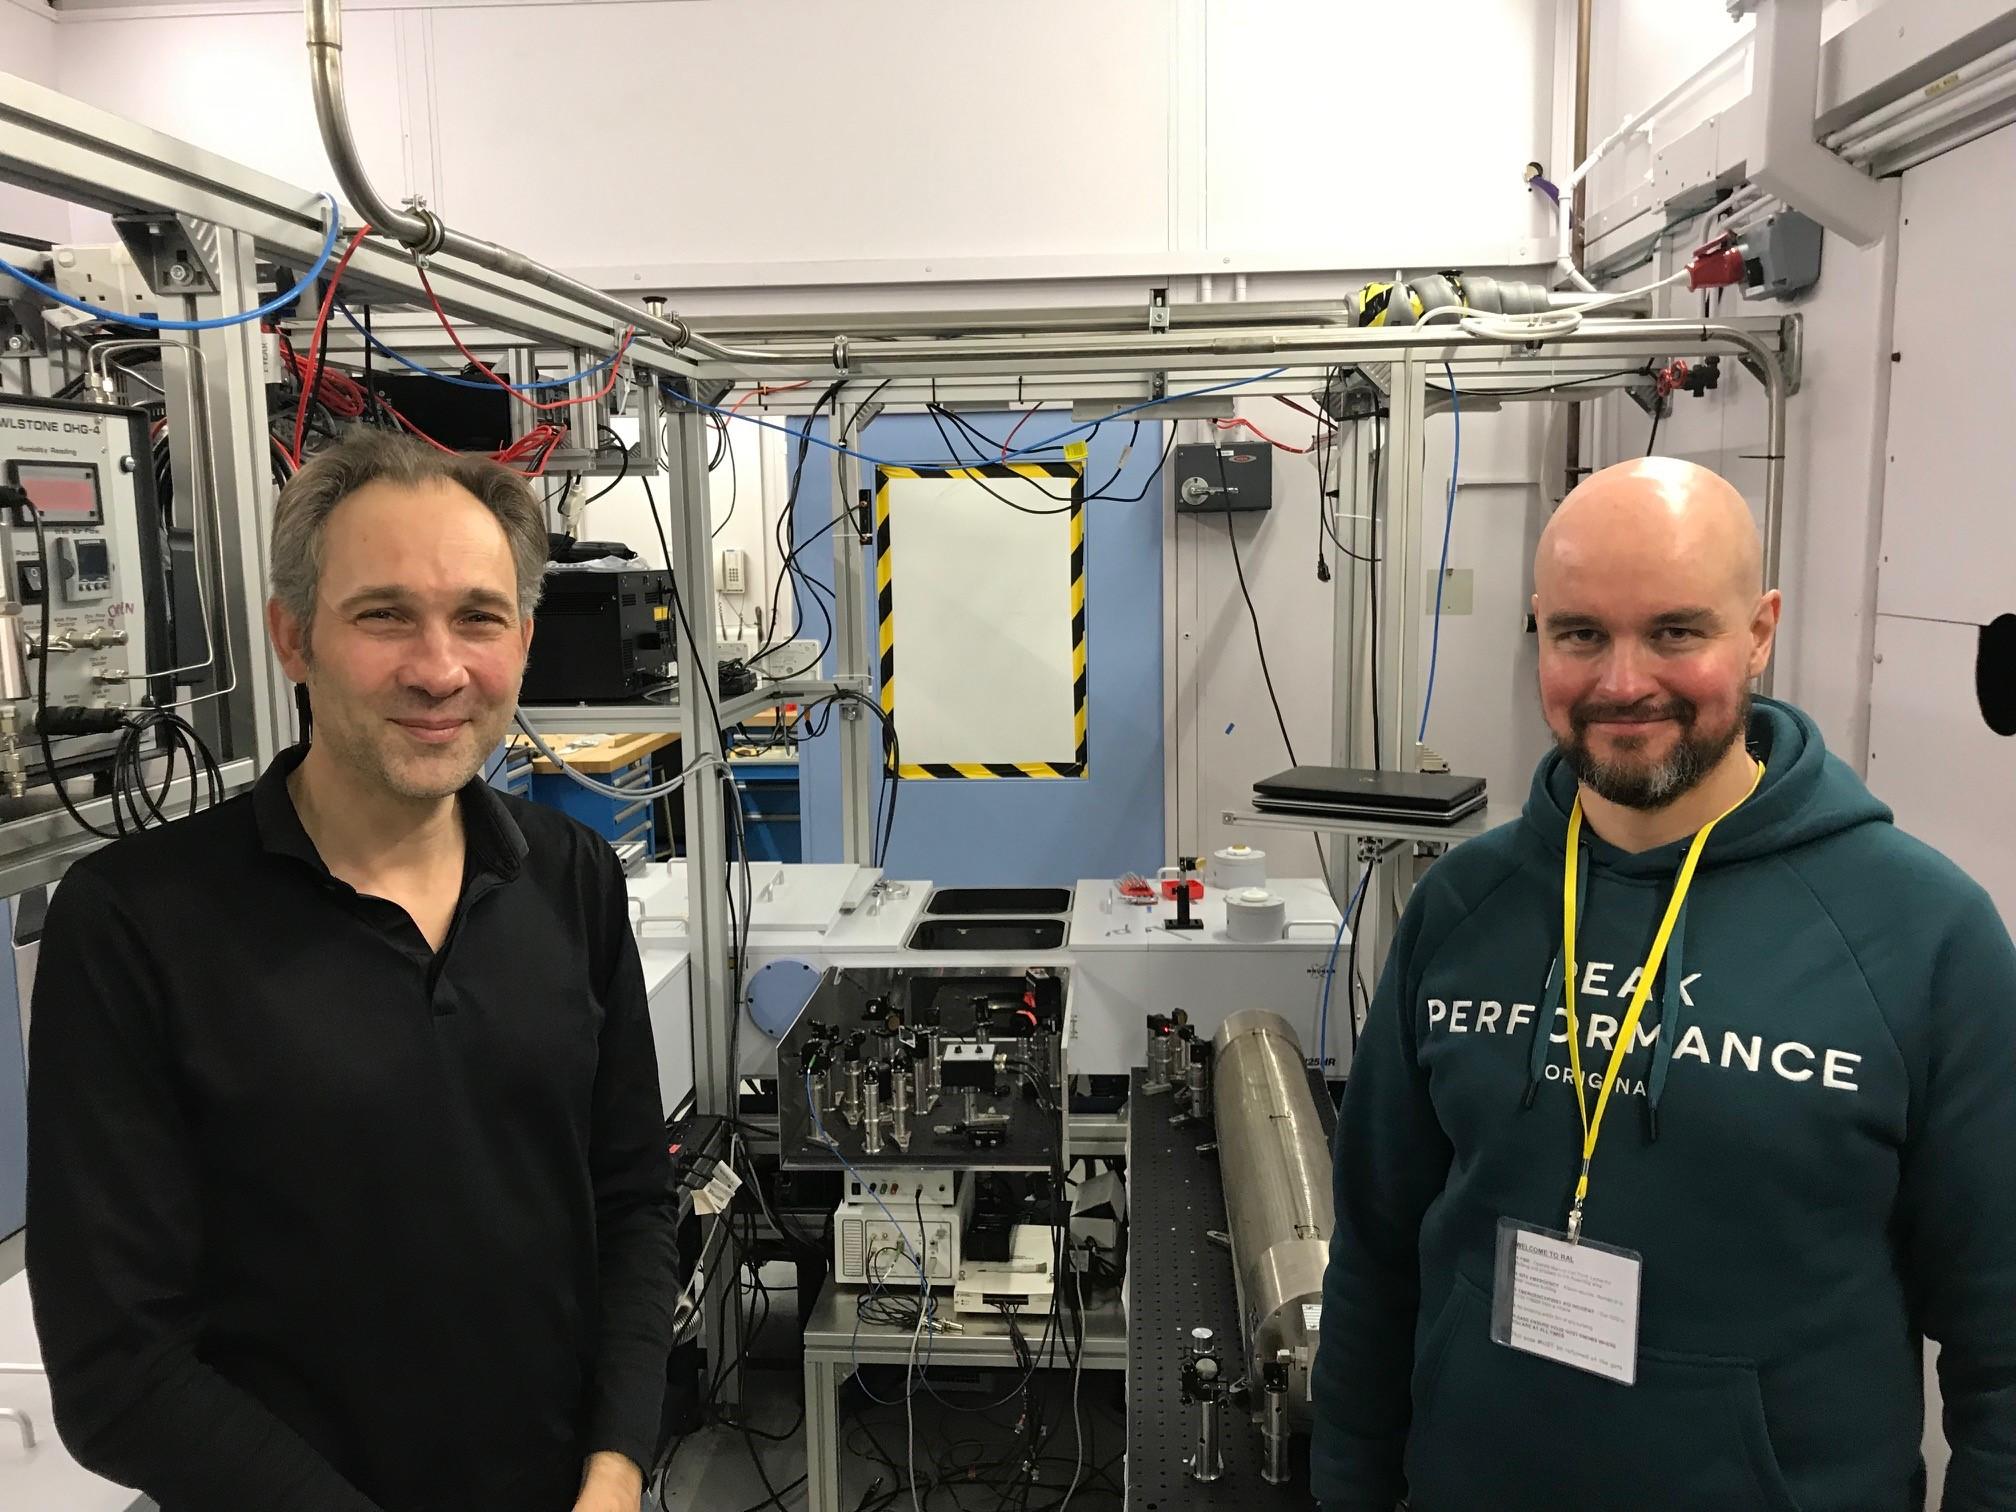 Damien Weidmann (left) and Seppänen (right) at the Rutherford Appleton Laboratory